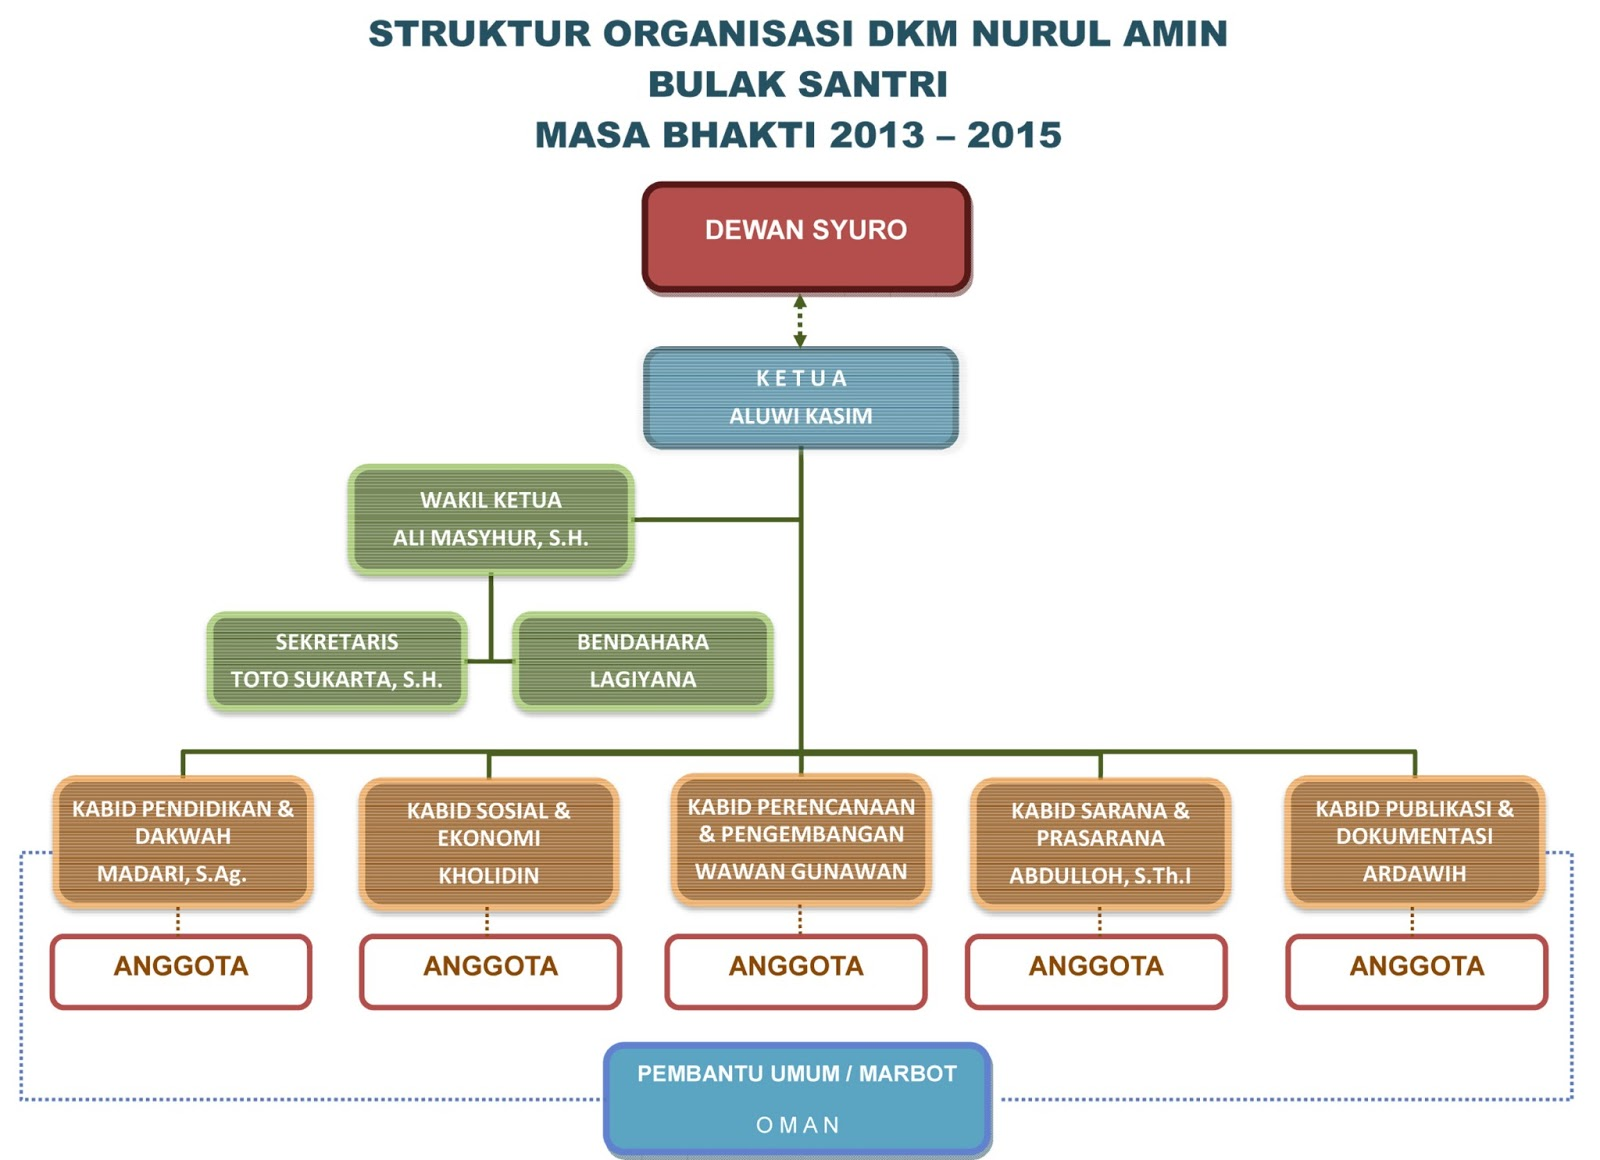 masjid nurul amin bulak santri struktur organisasi Struktur Organisasi Indofood struktur organisasi diposting oleh masjid nurul amin bulak santri di 10 03